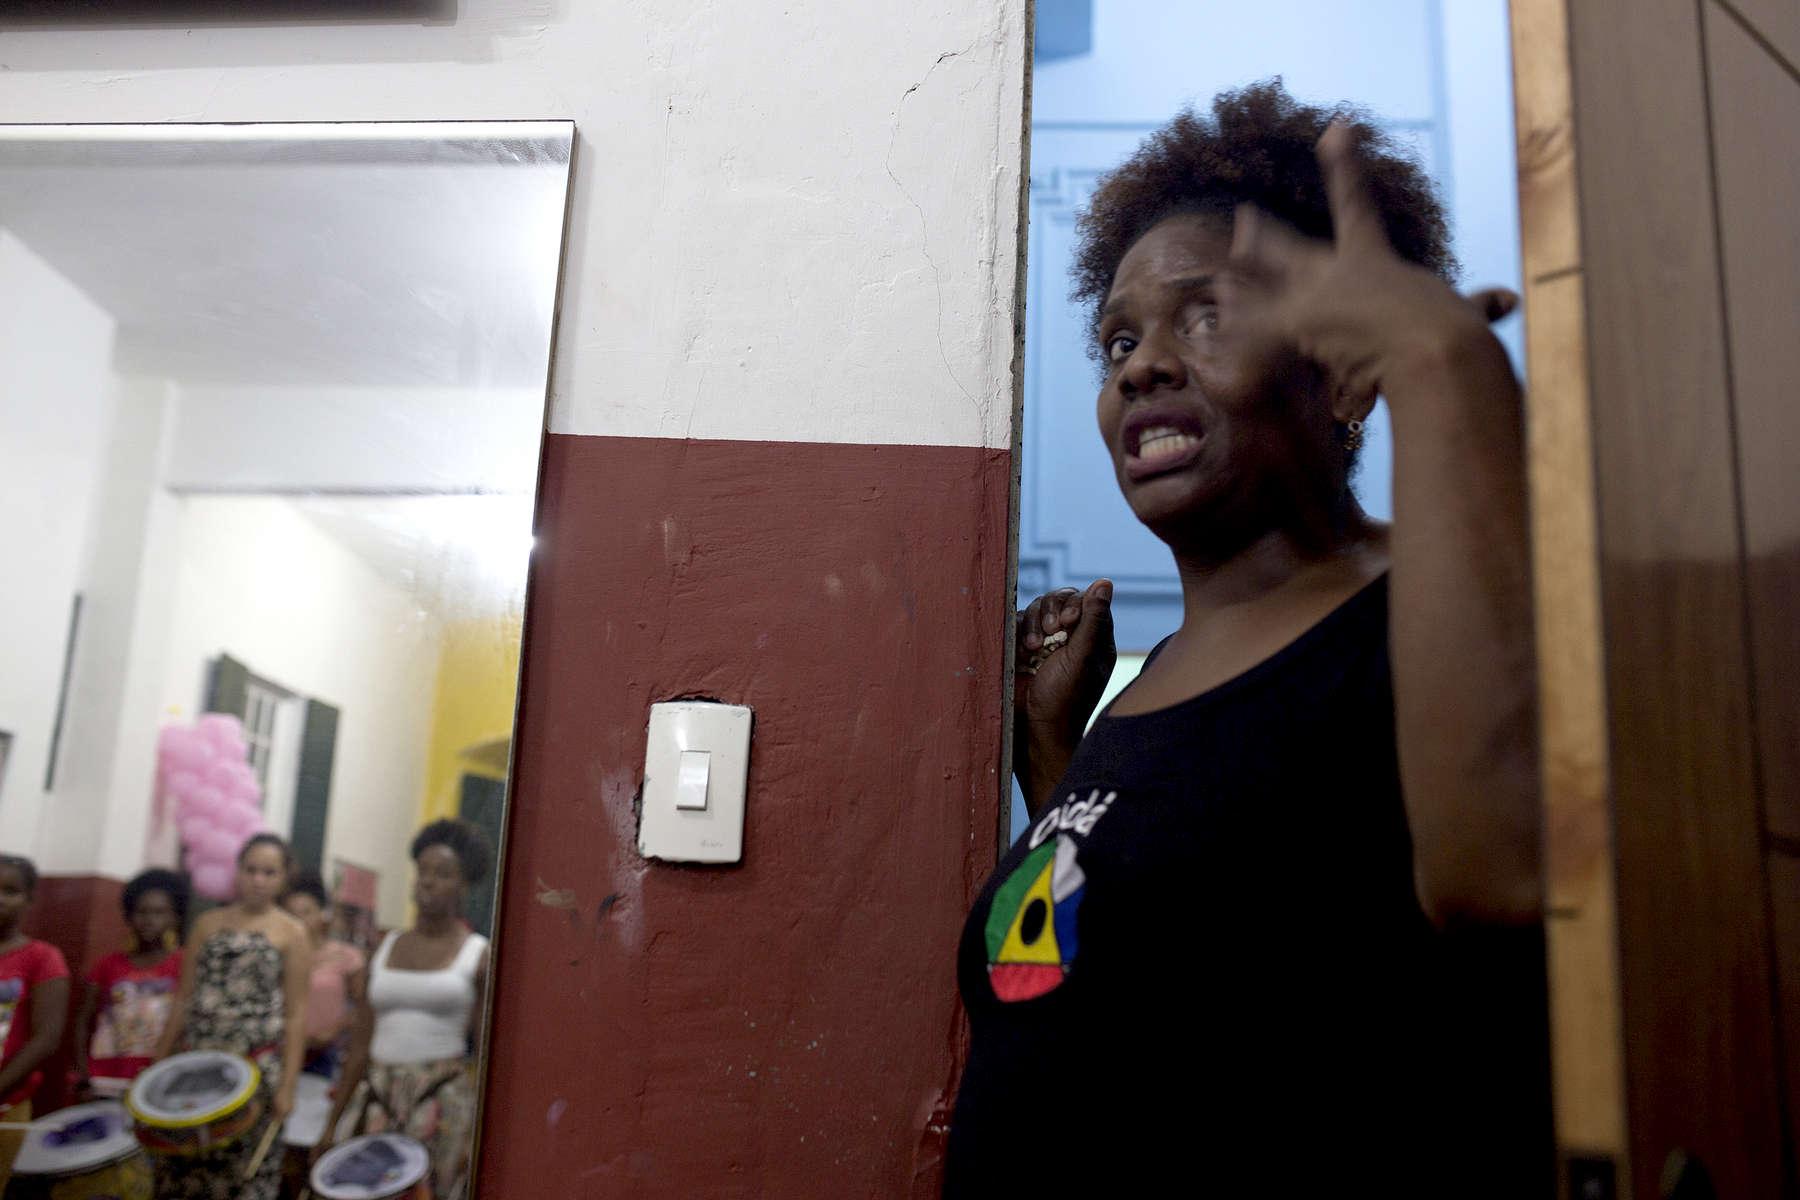 Debora Souza, daughter of Didá founder Neguinho do Samba, checks on the women during practice.